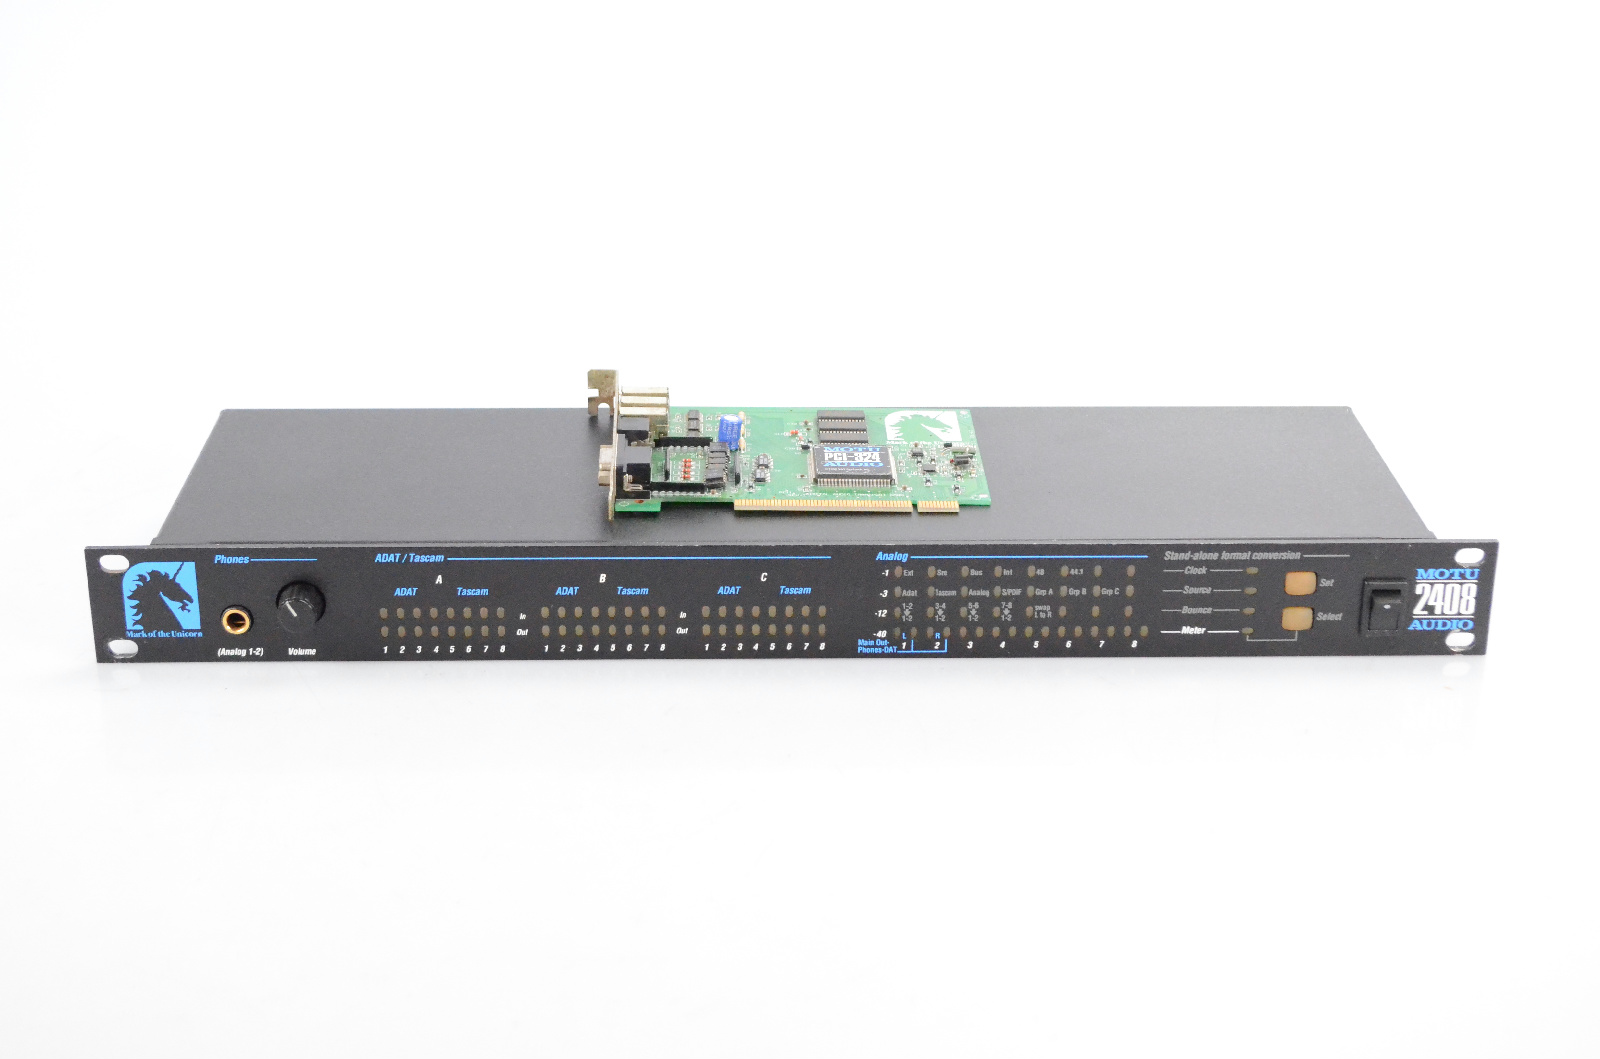 MOTU 2408 Audio Computer Recording Firewire FW Interface w/ PCI-324 Card #32383